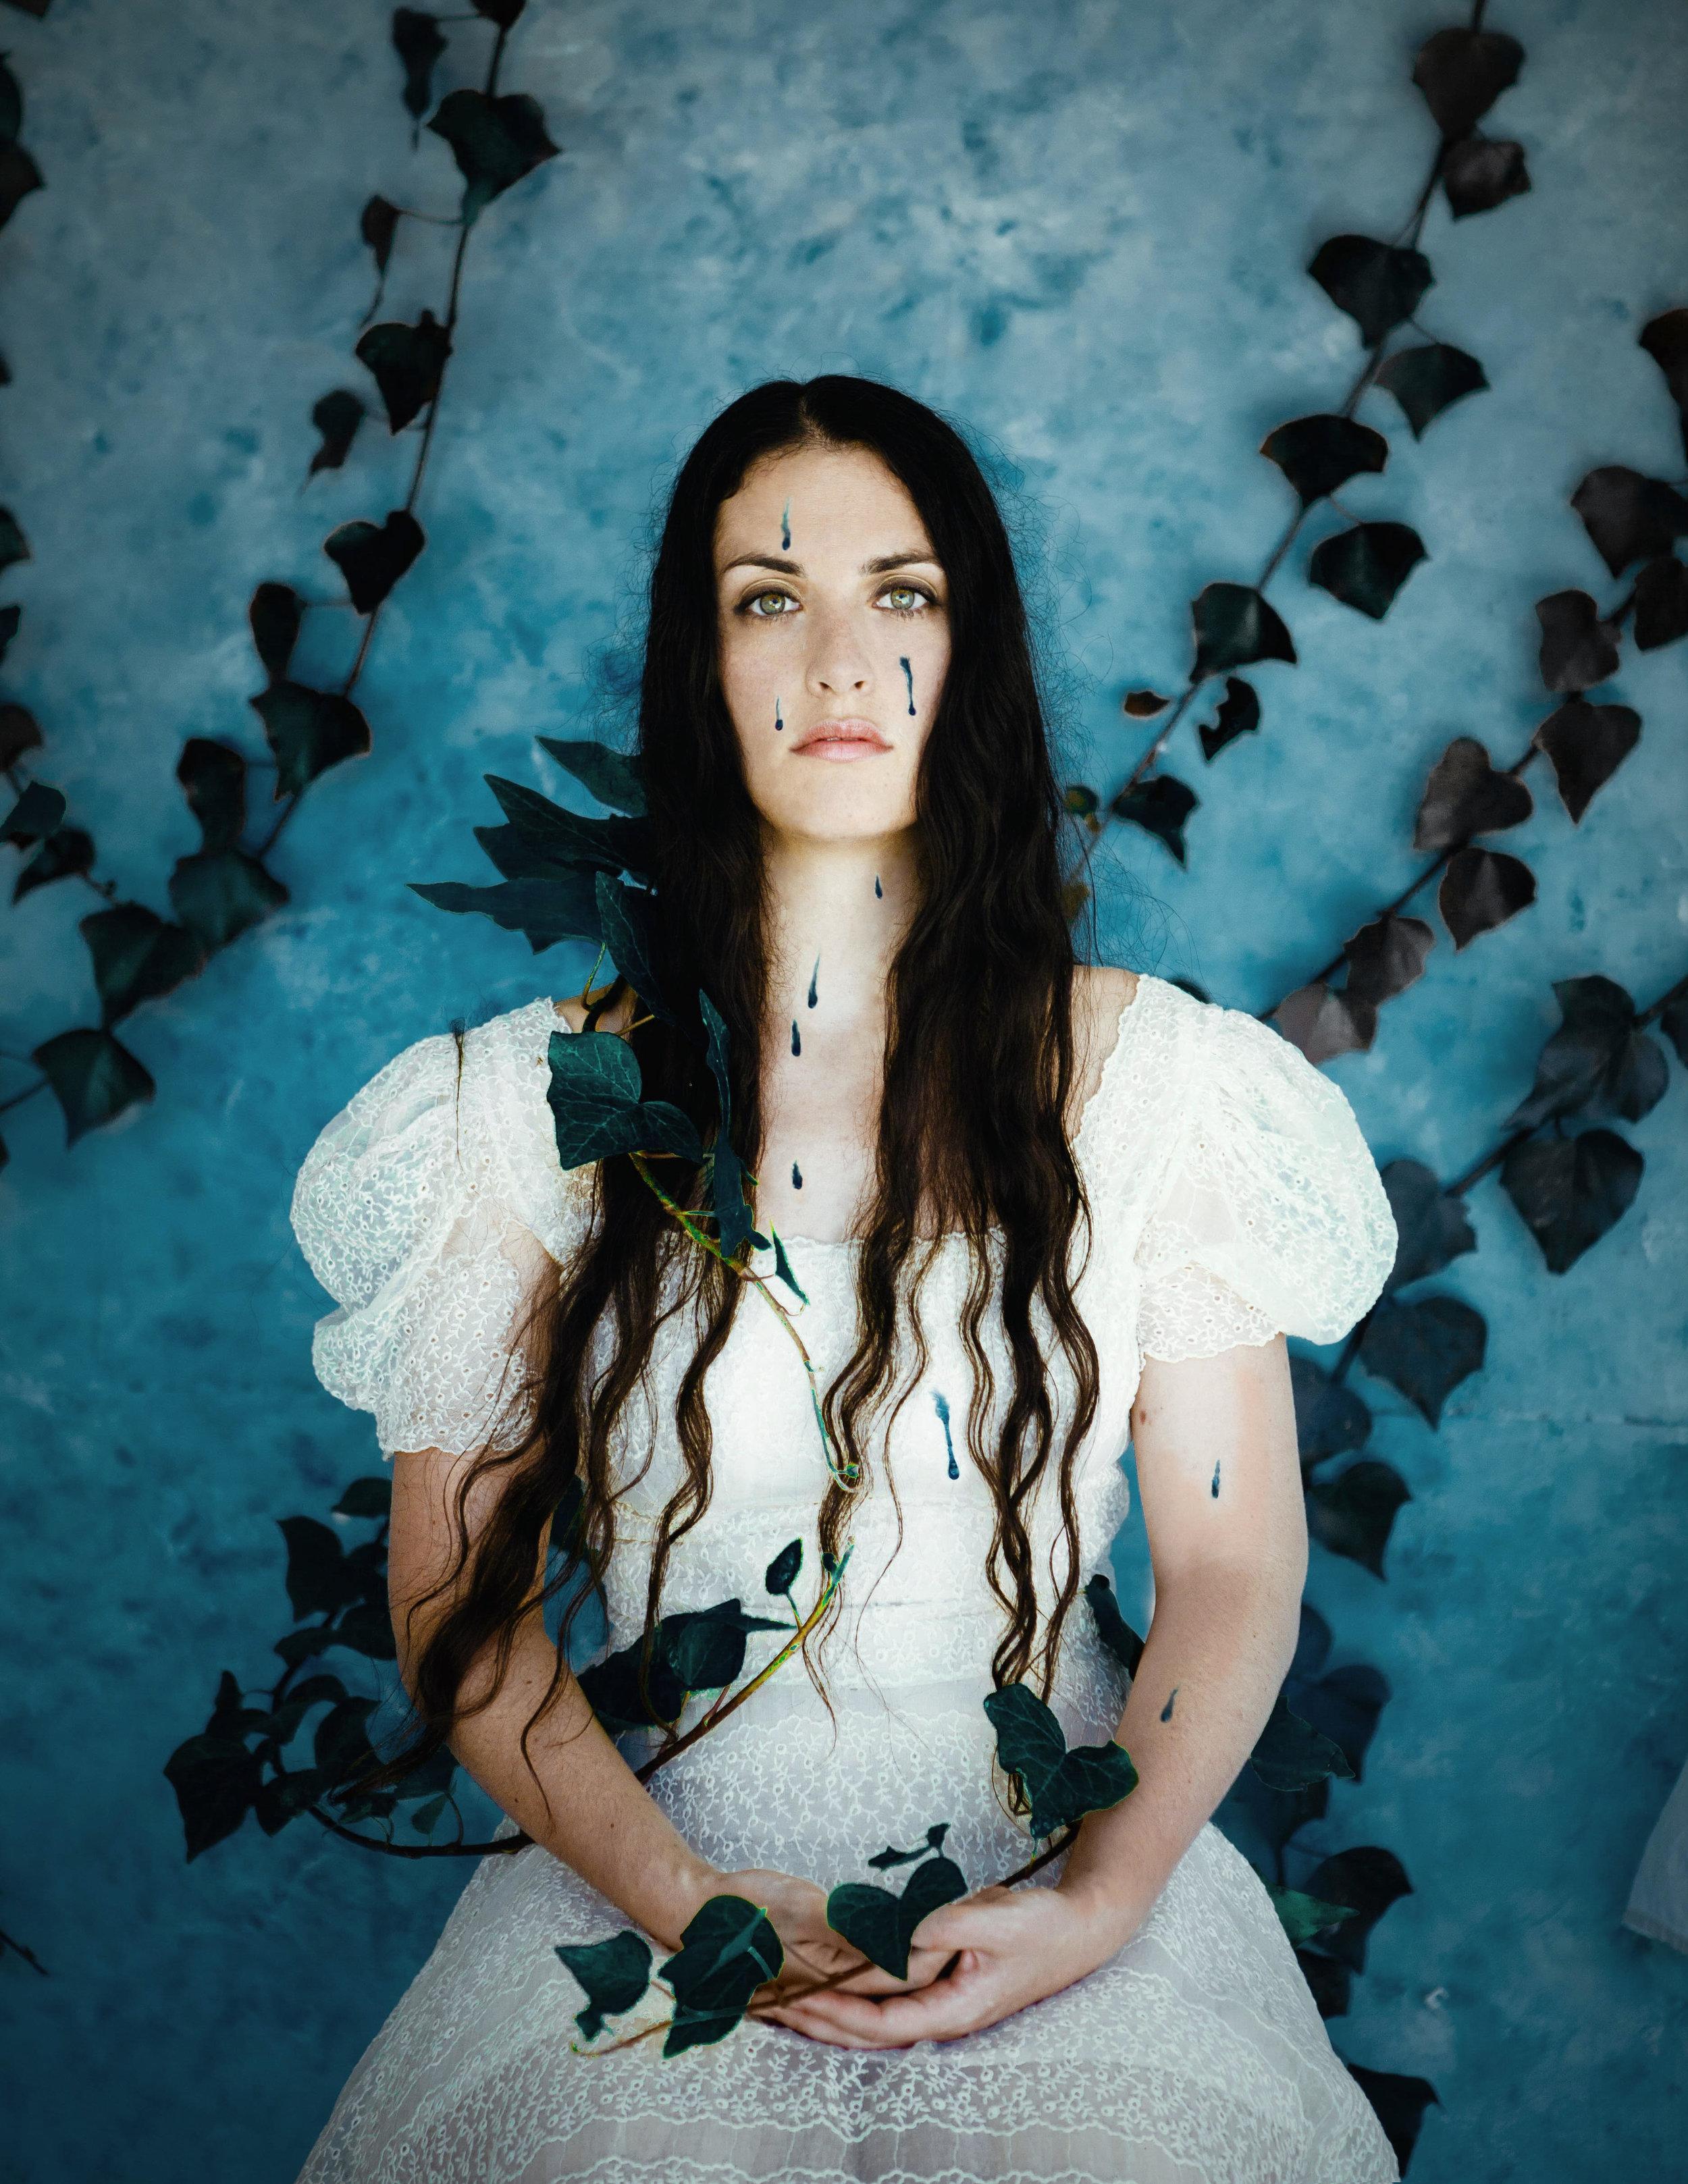 Marya_stark_abstract_art_grief_as_praise_vulnerability_brene_brown_regina_spektor_alanis.jpg